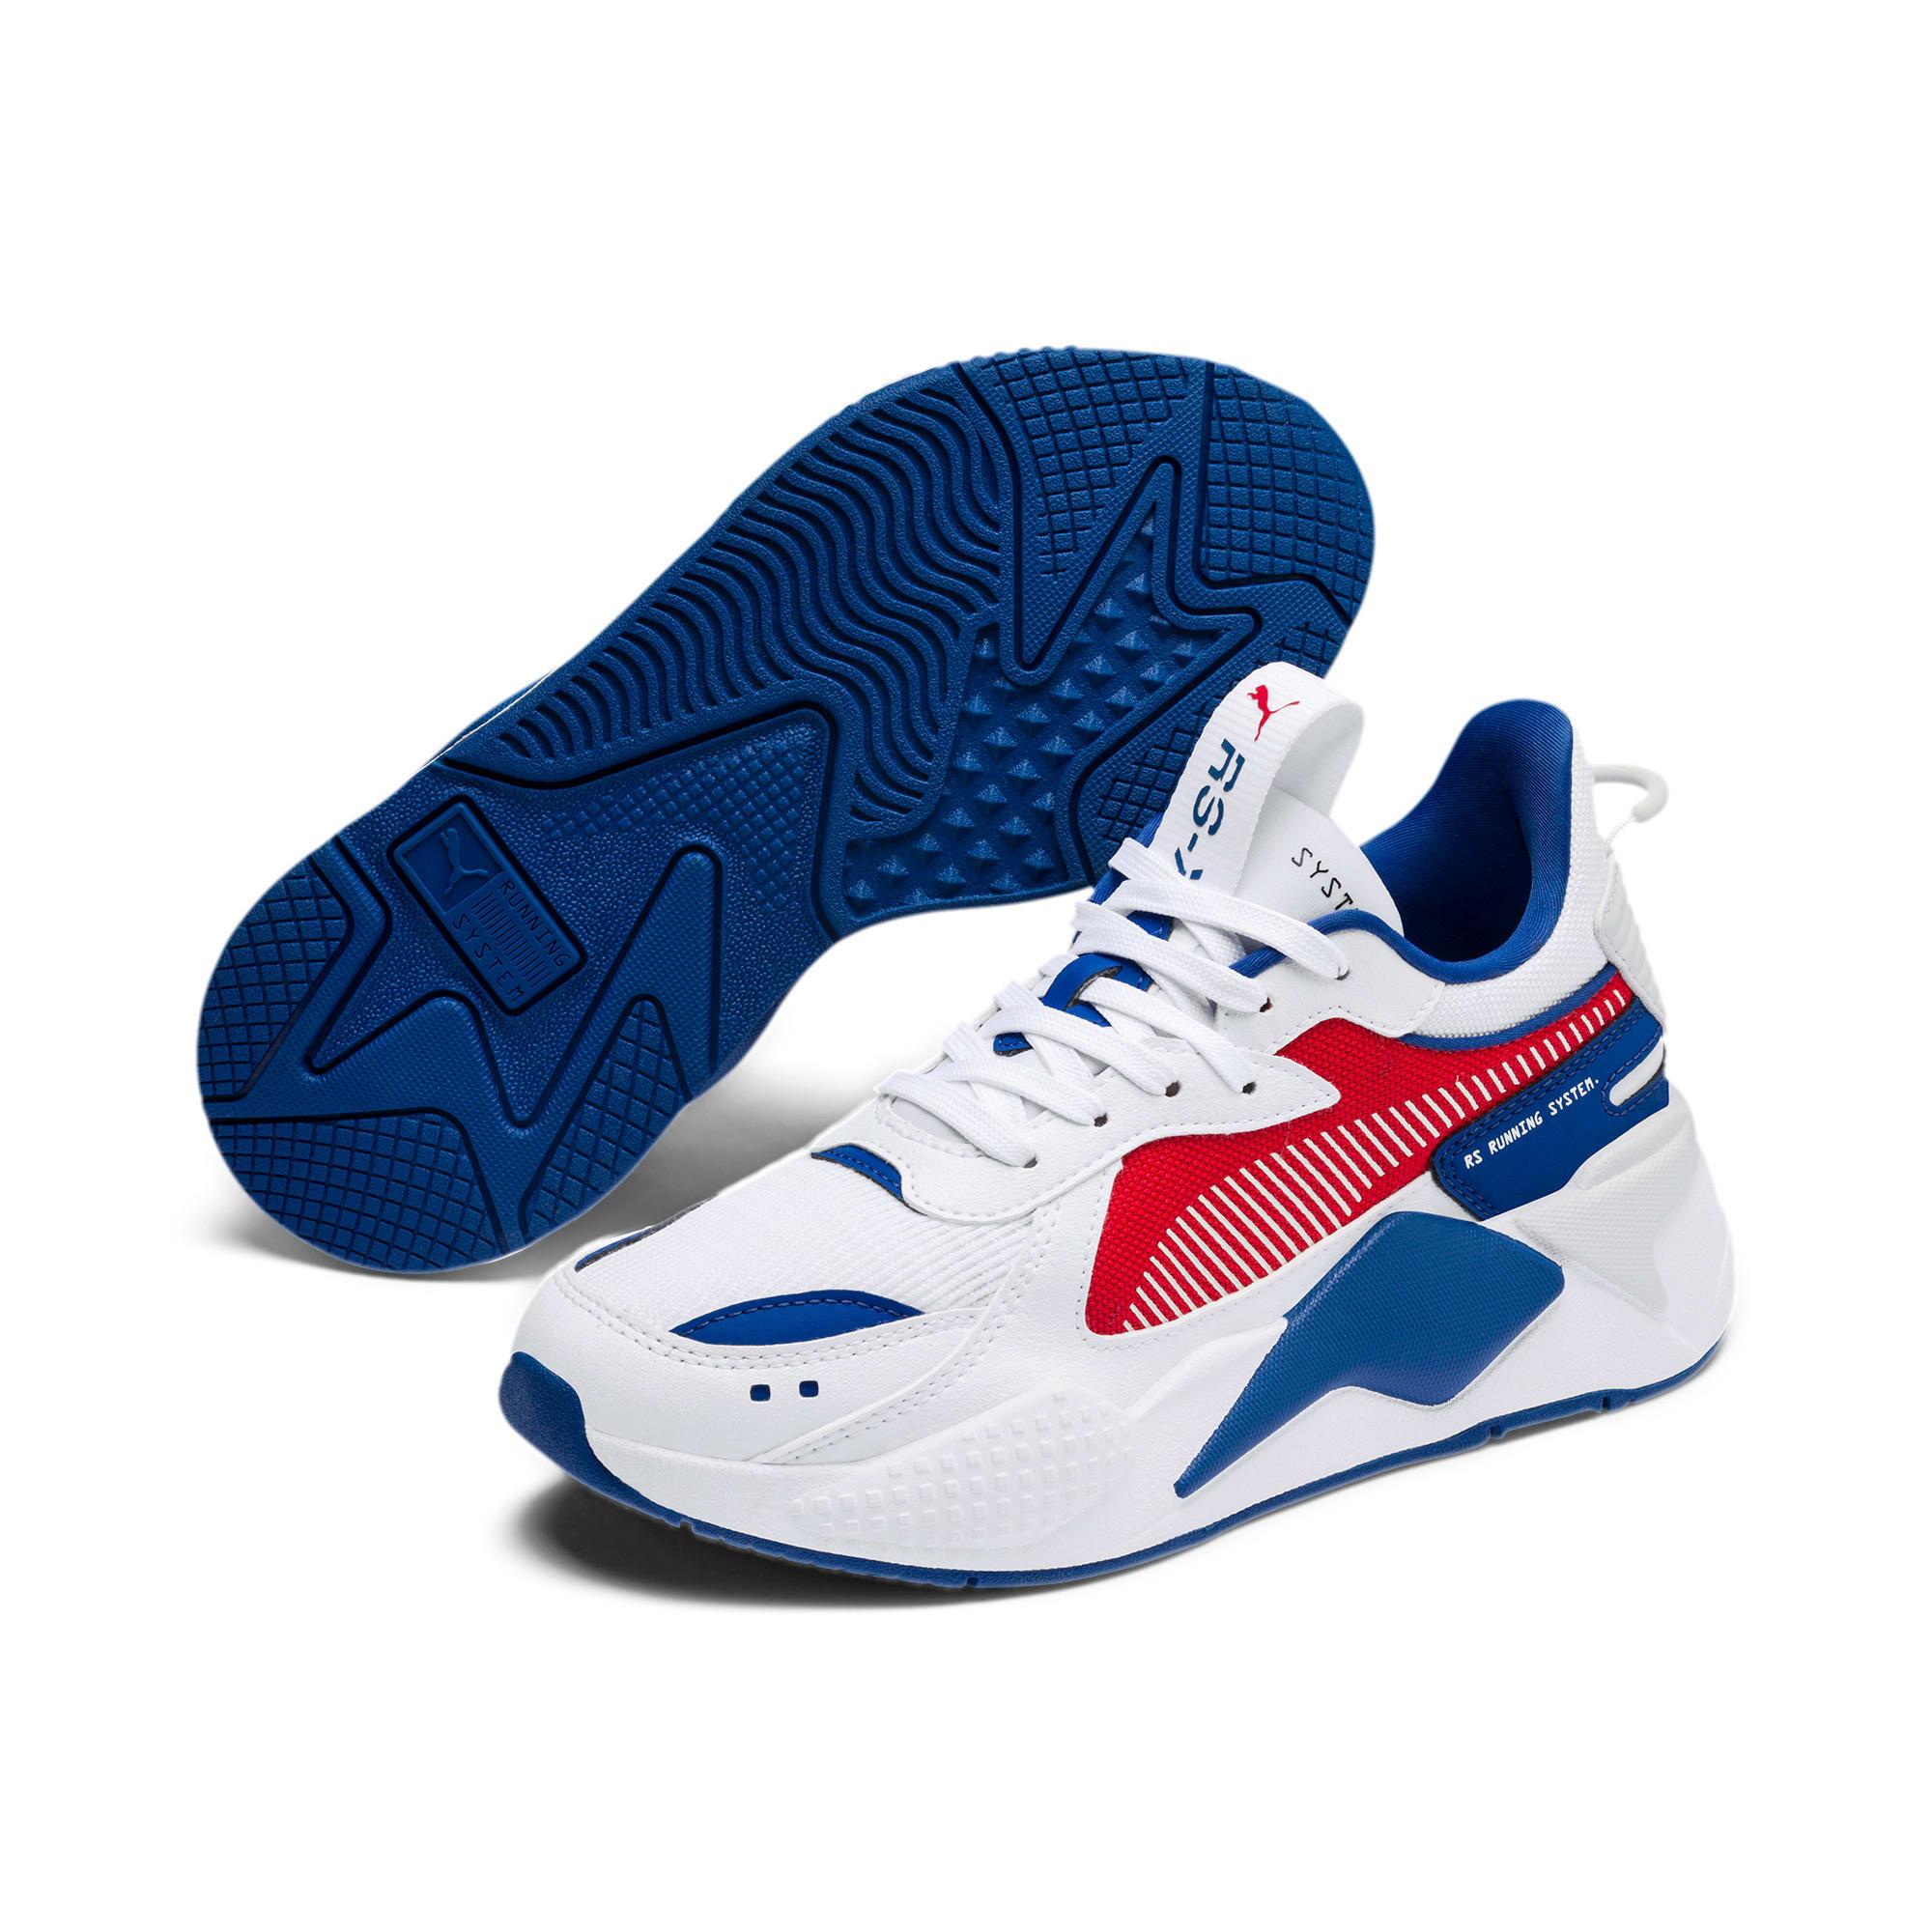 Thumbnail 2 of RS-X Hard Drive Sneakers JR, Puma White-High Risk Red, medium